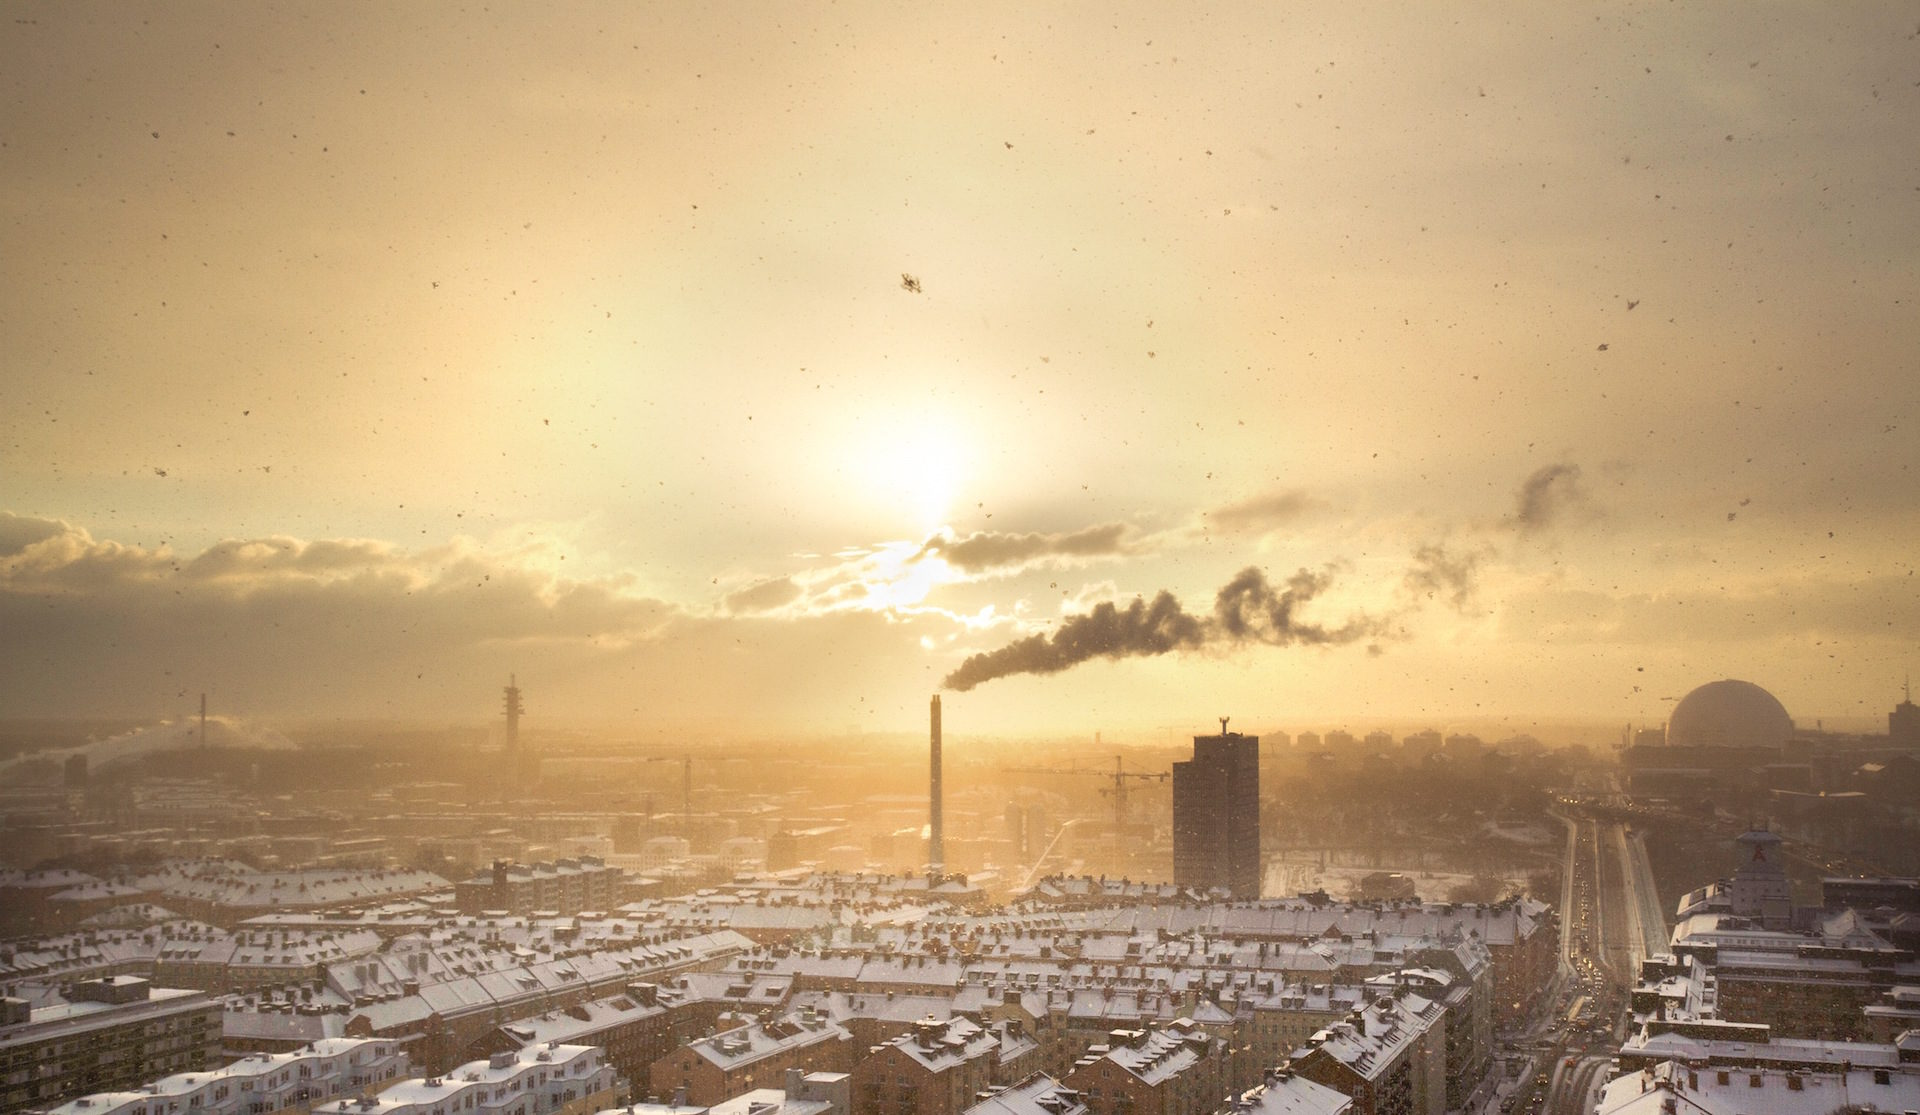 humo, nubes, polución, contaminación, polvo - Fondos de Pantalla HD - professor-falken.com